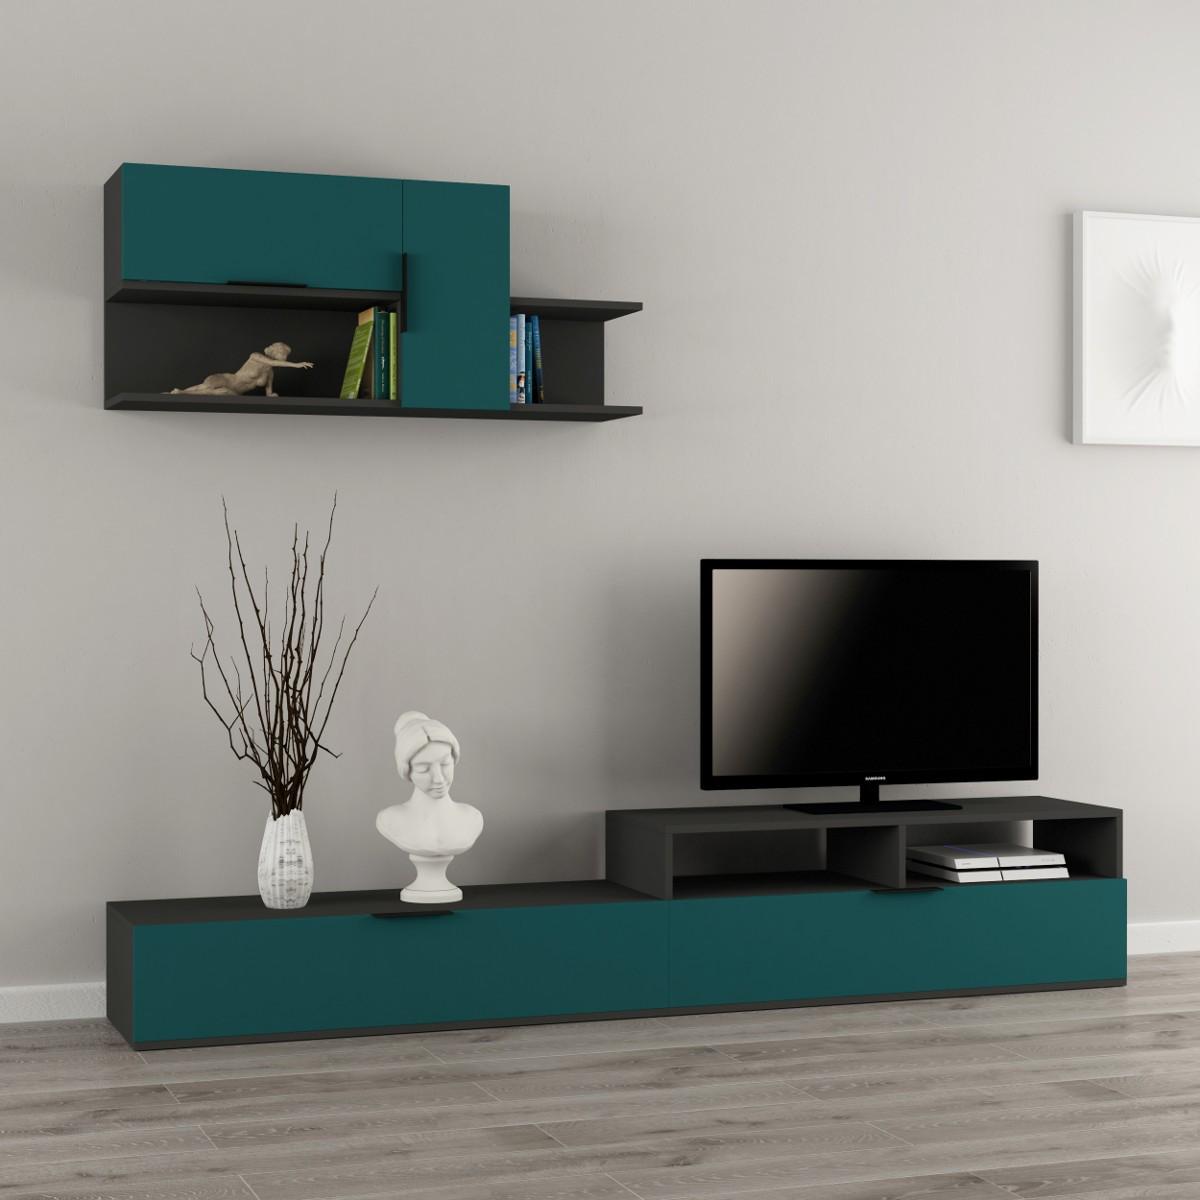 Porta TV parete attrezzata Adair